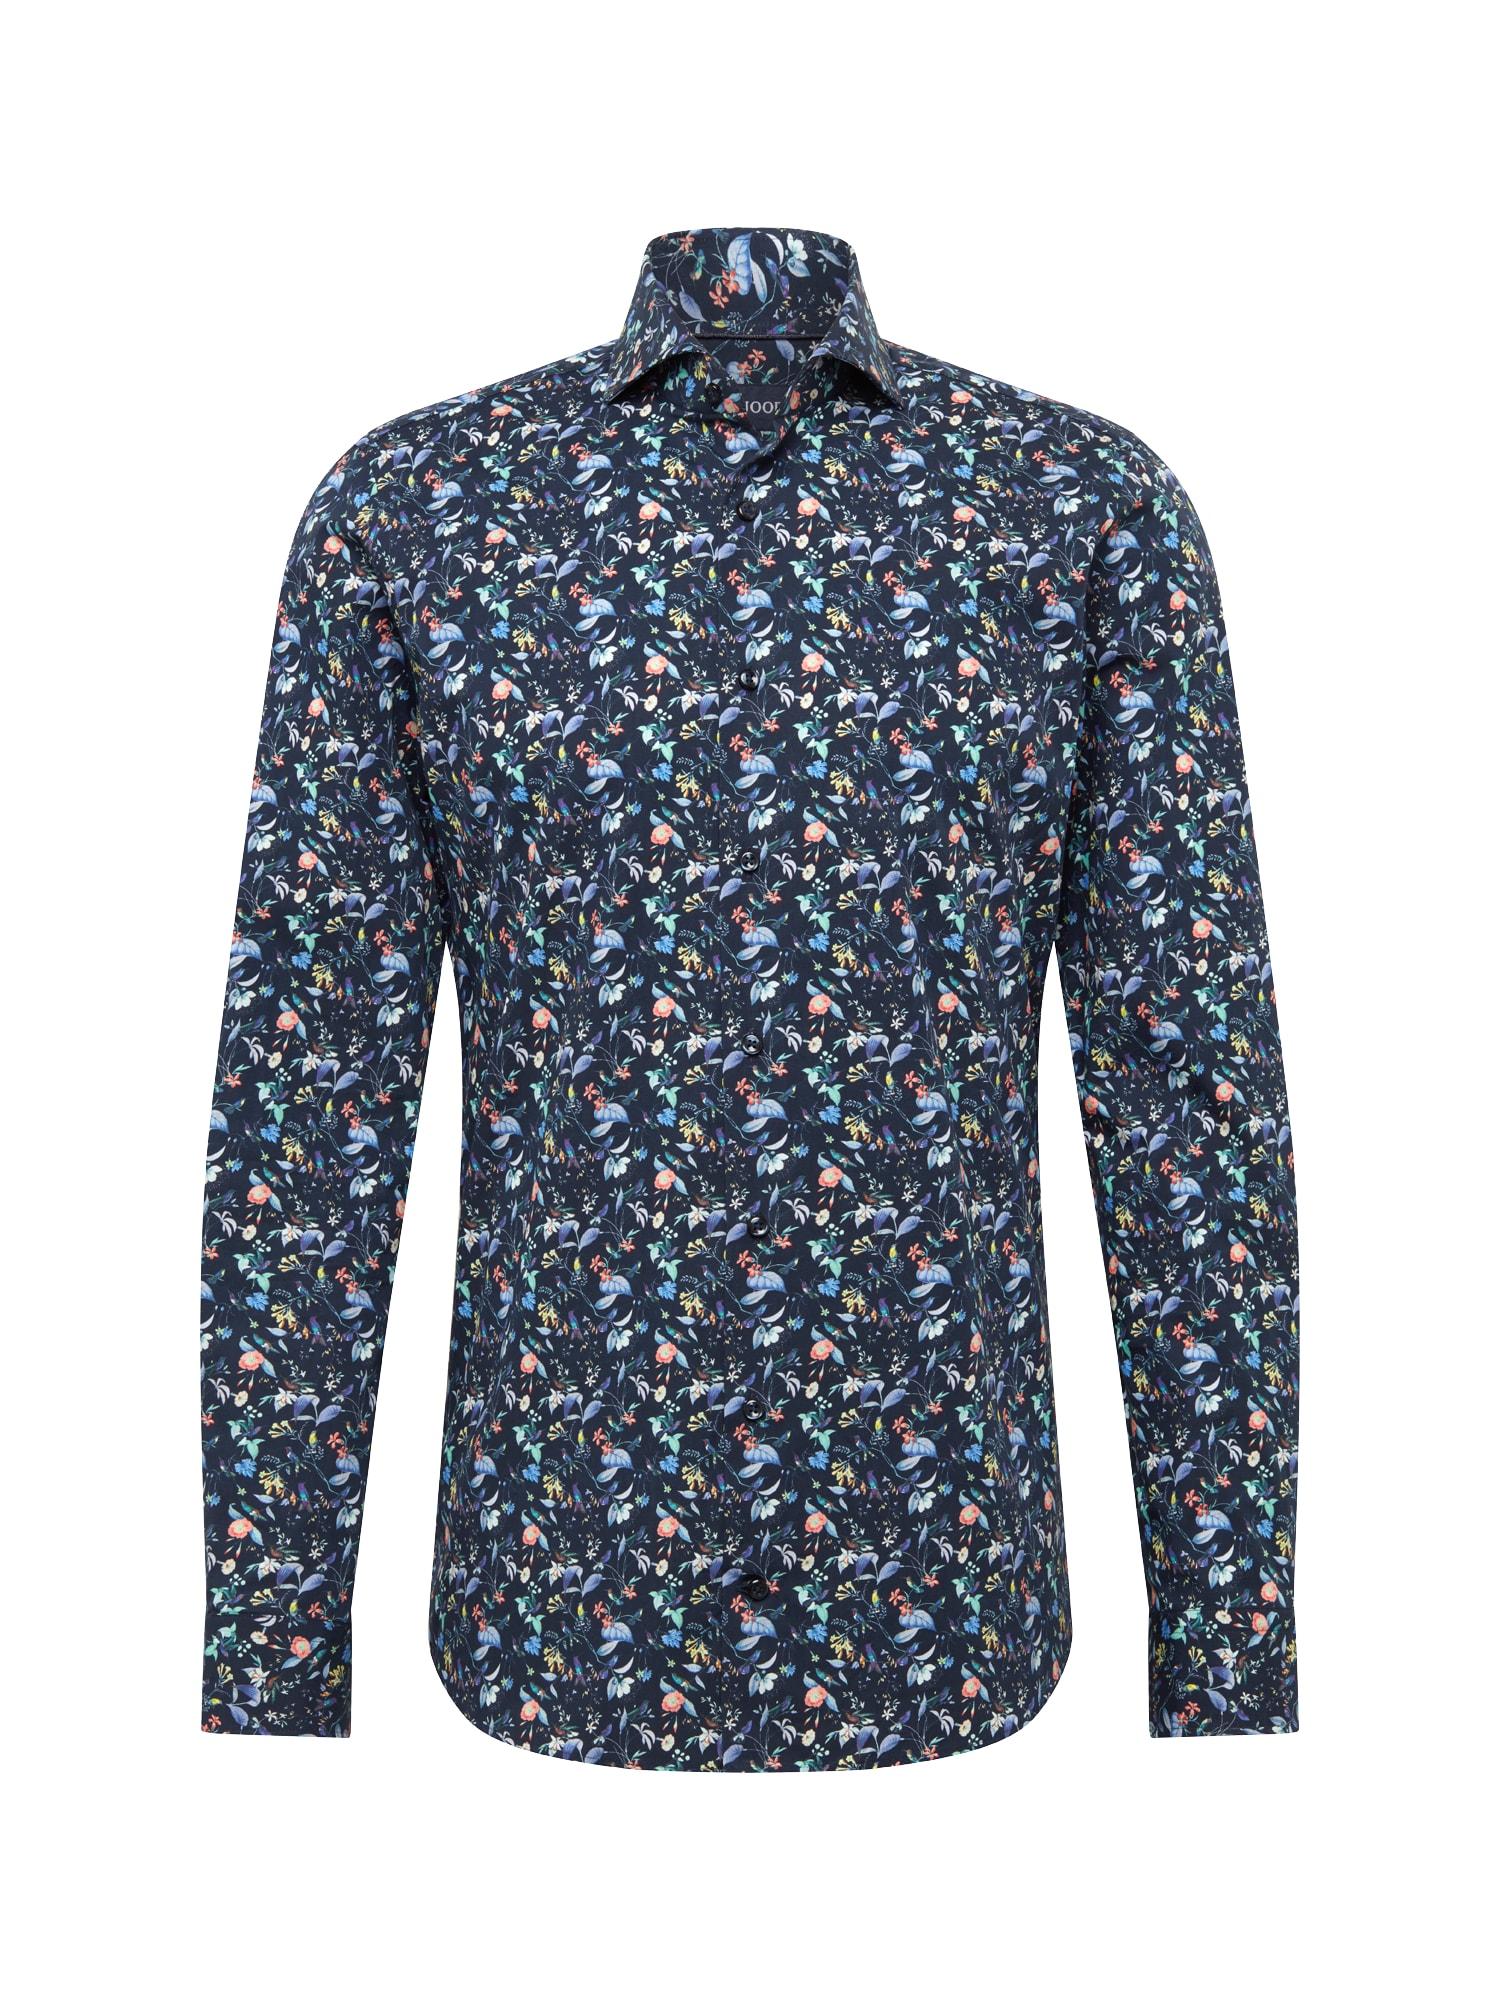 Košile 17 JSH-52Pajos 10006858 tmavě modrá JOOP!